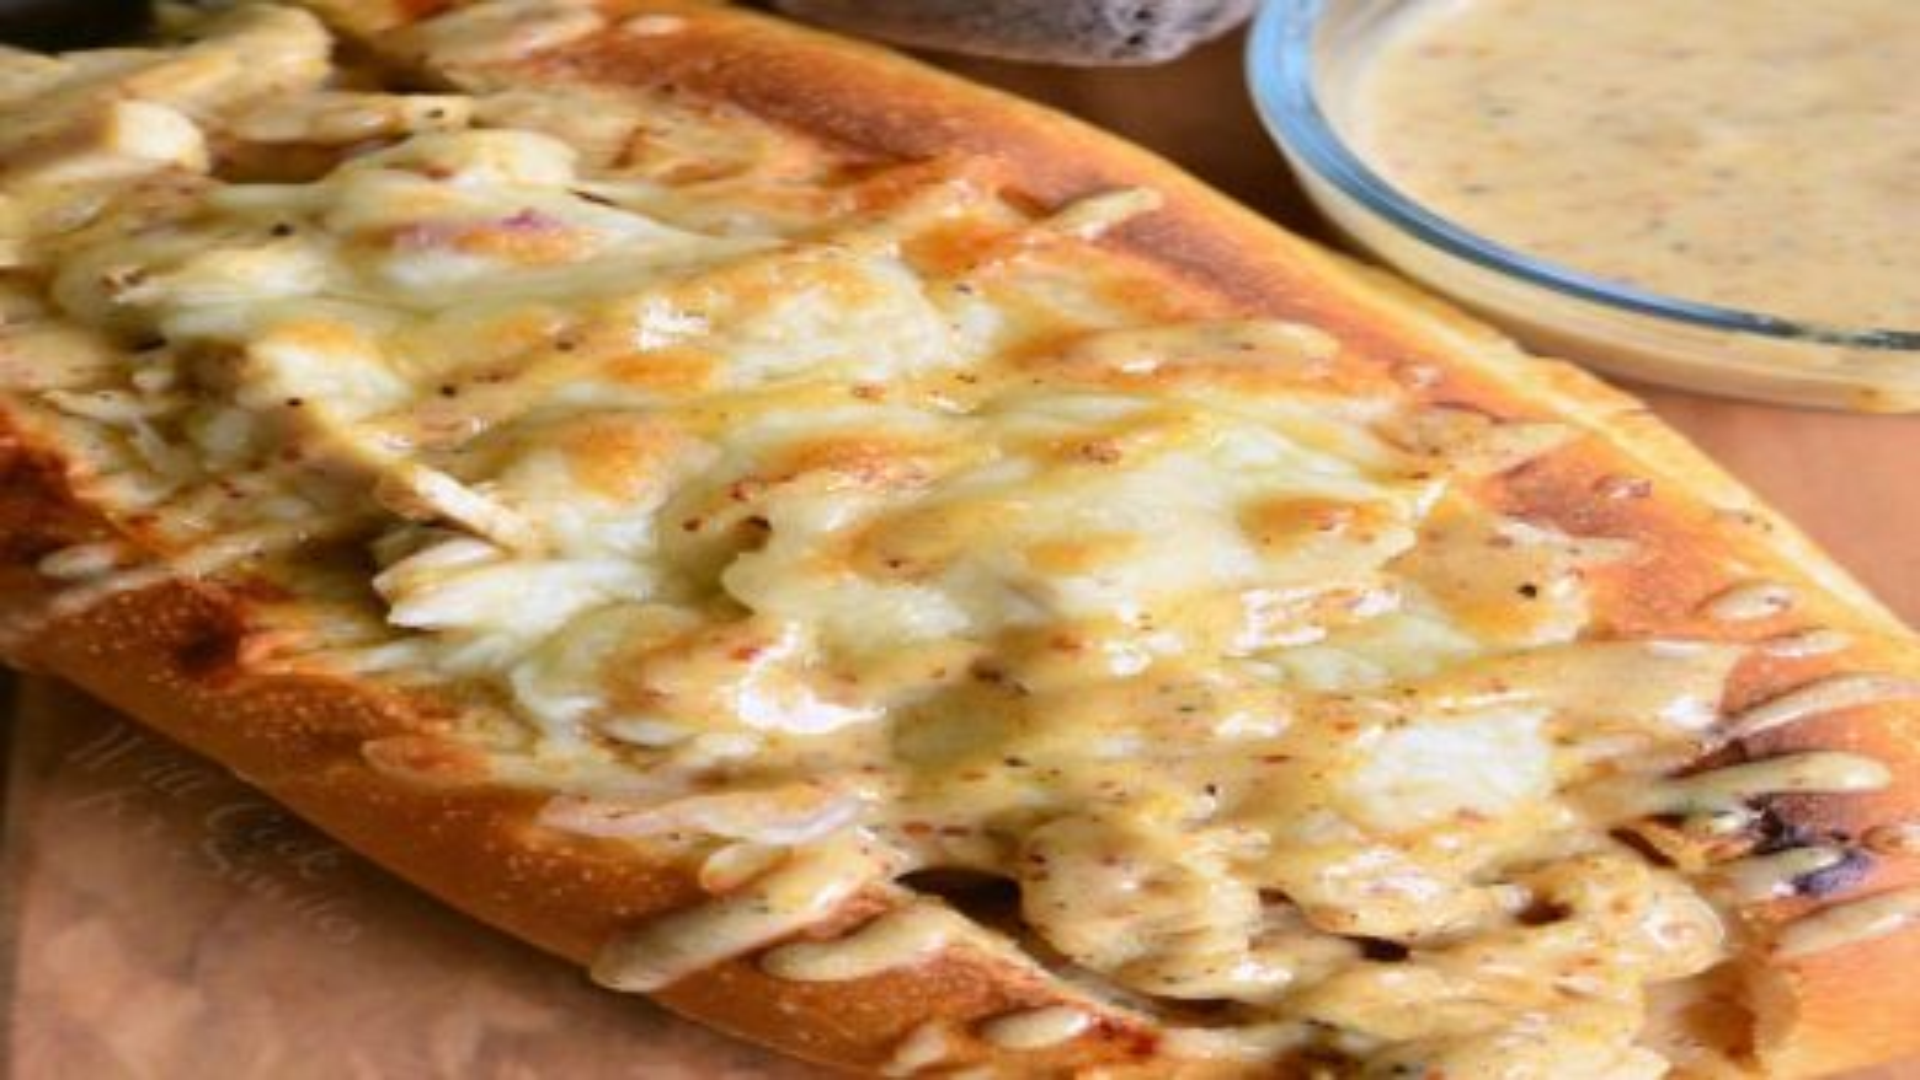 نان مرغ پنیری | تگ